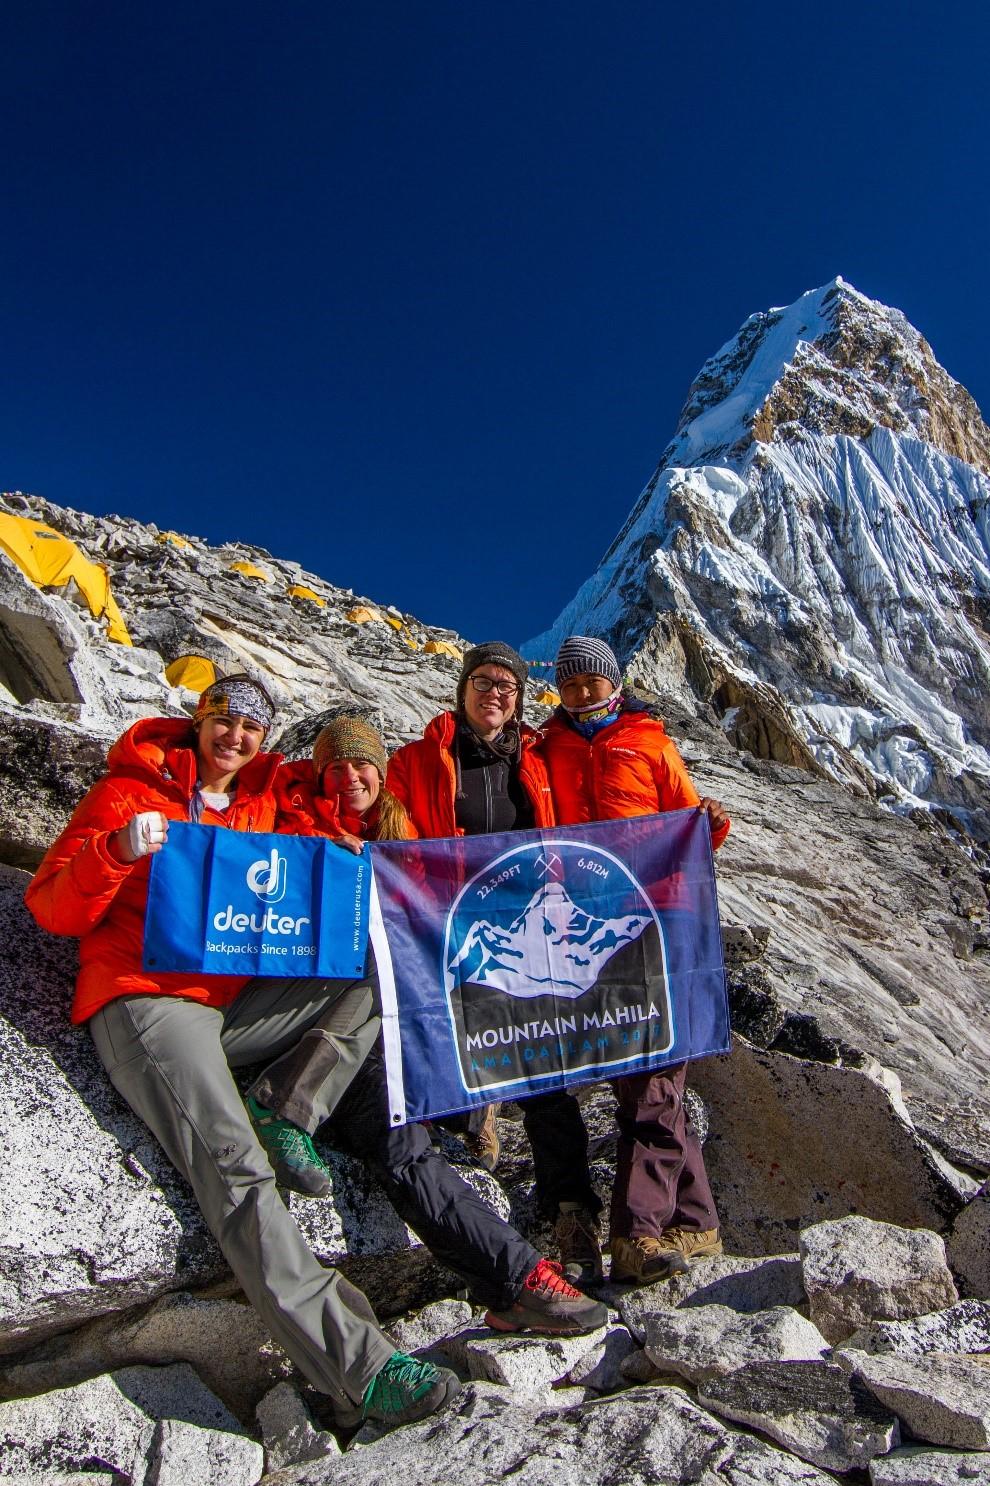 The full Mountain Mahila team at Camp 1 on Ama Dablam: Kim, Ida, Tammy and Phurba. (Photo credit: Ida Vincent